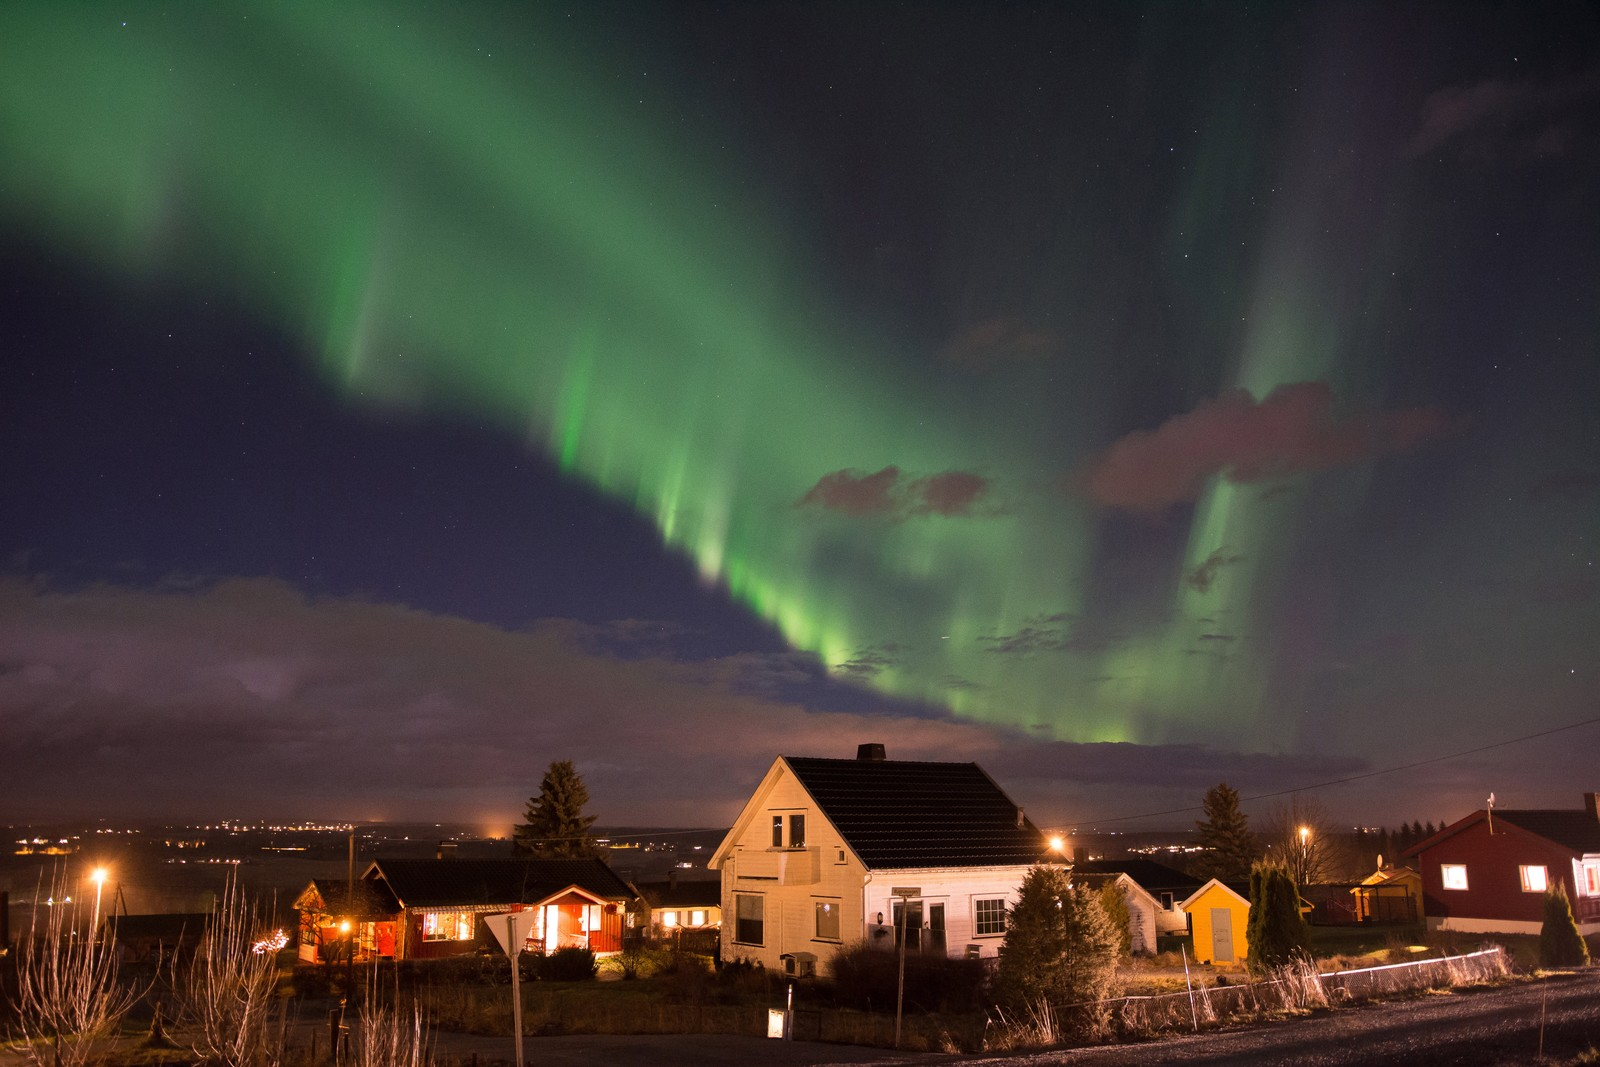 Ottestad, Stange